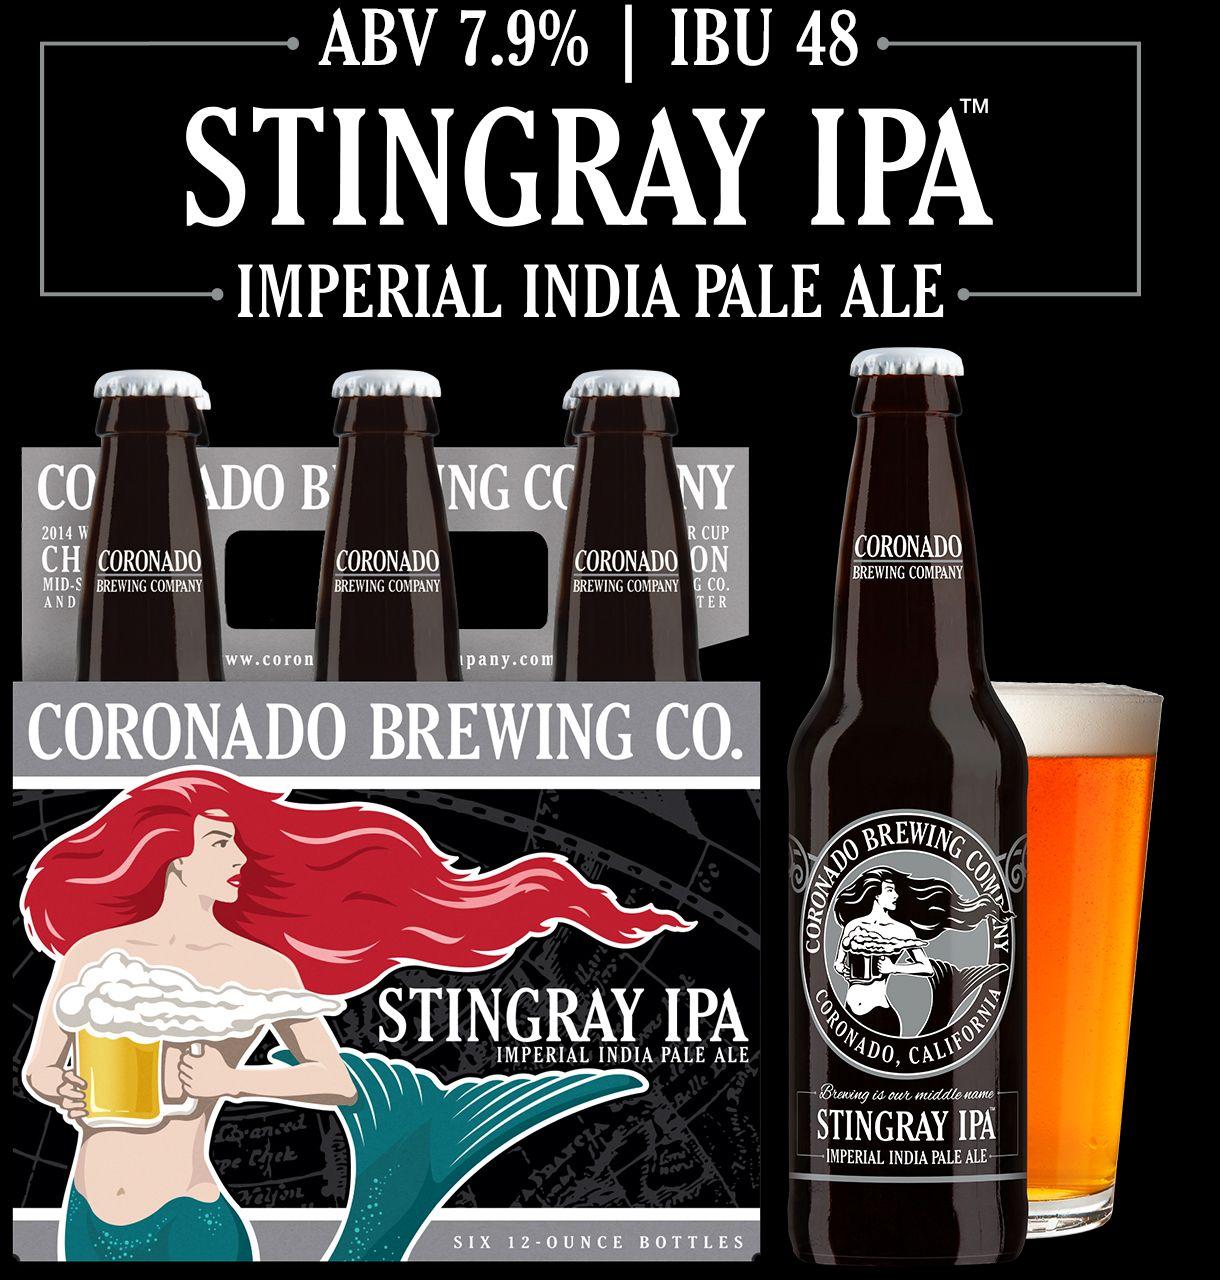 Stingray IPA Coronado Brewing Company | Craft beer